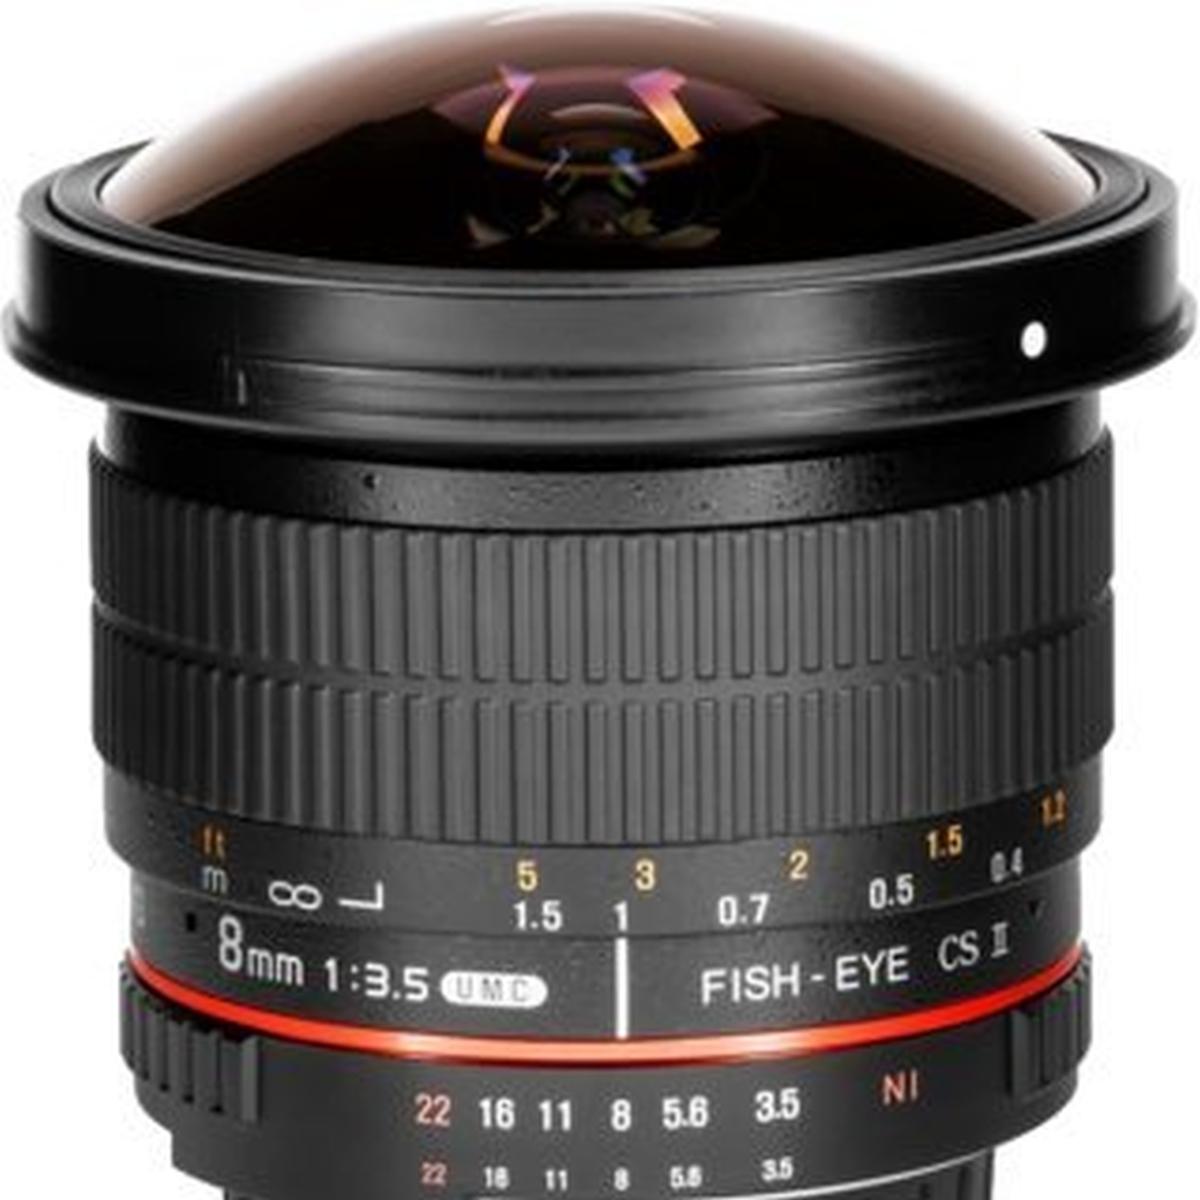 Samyang 8 mm 1:3,5 Fisheye CS II für Nikon